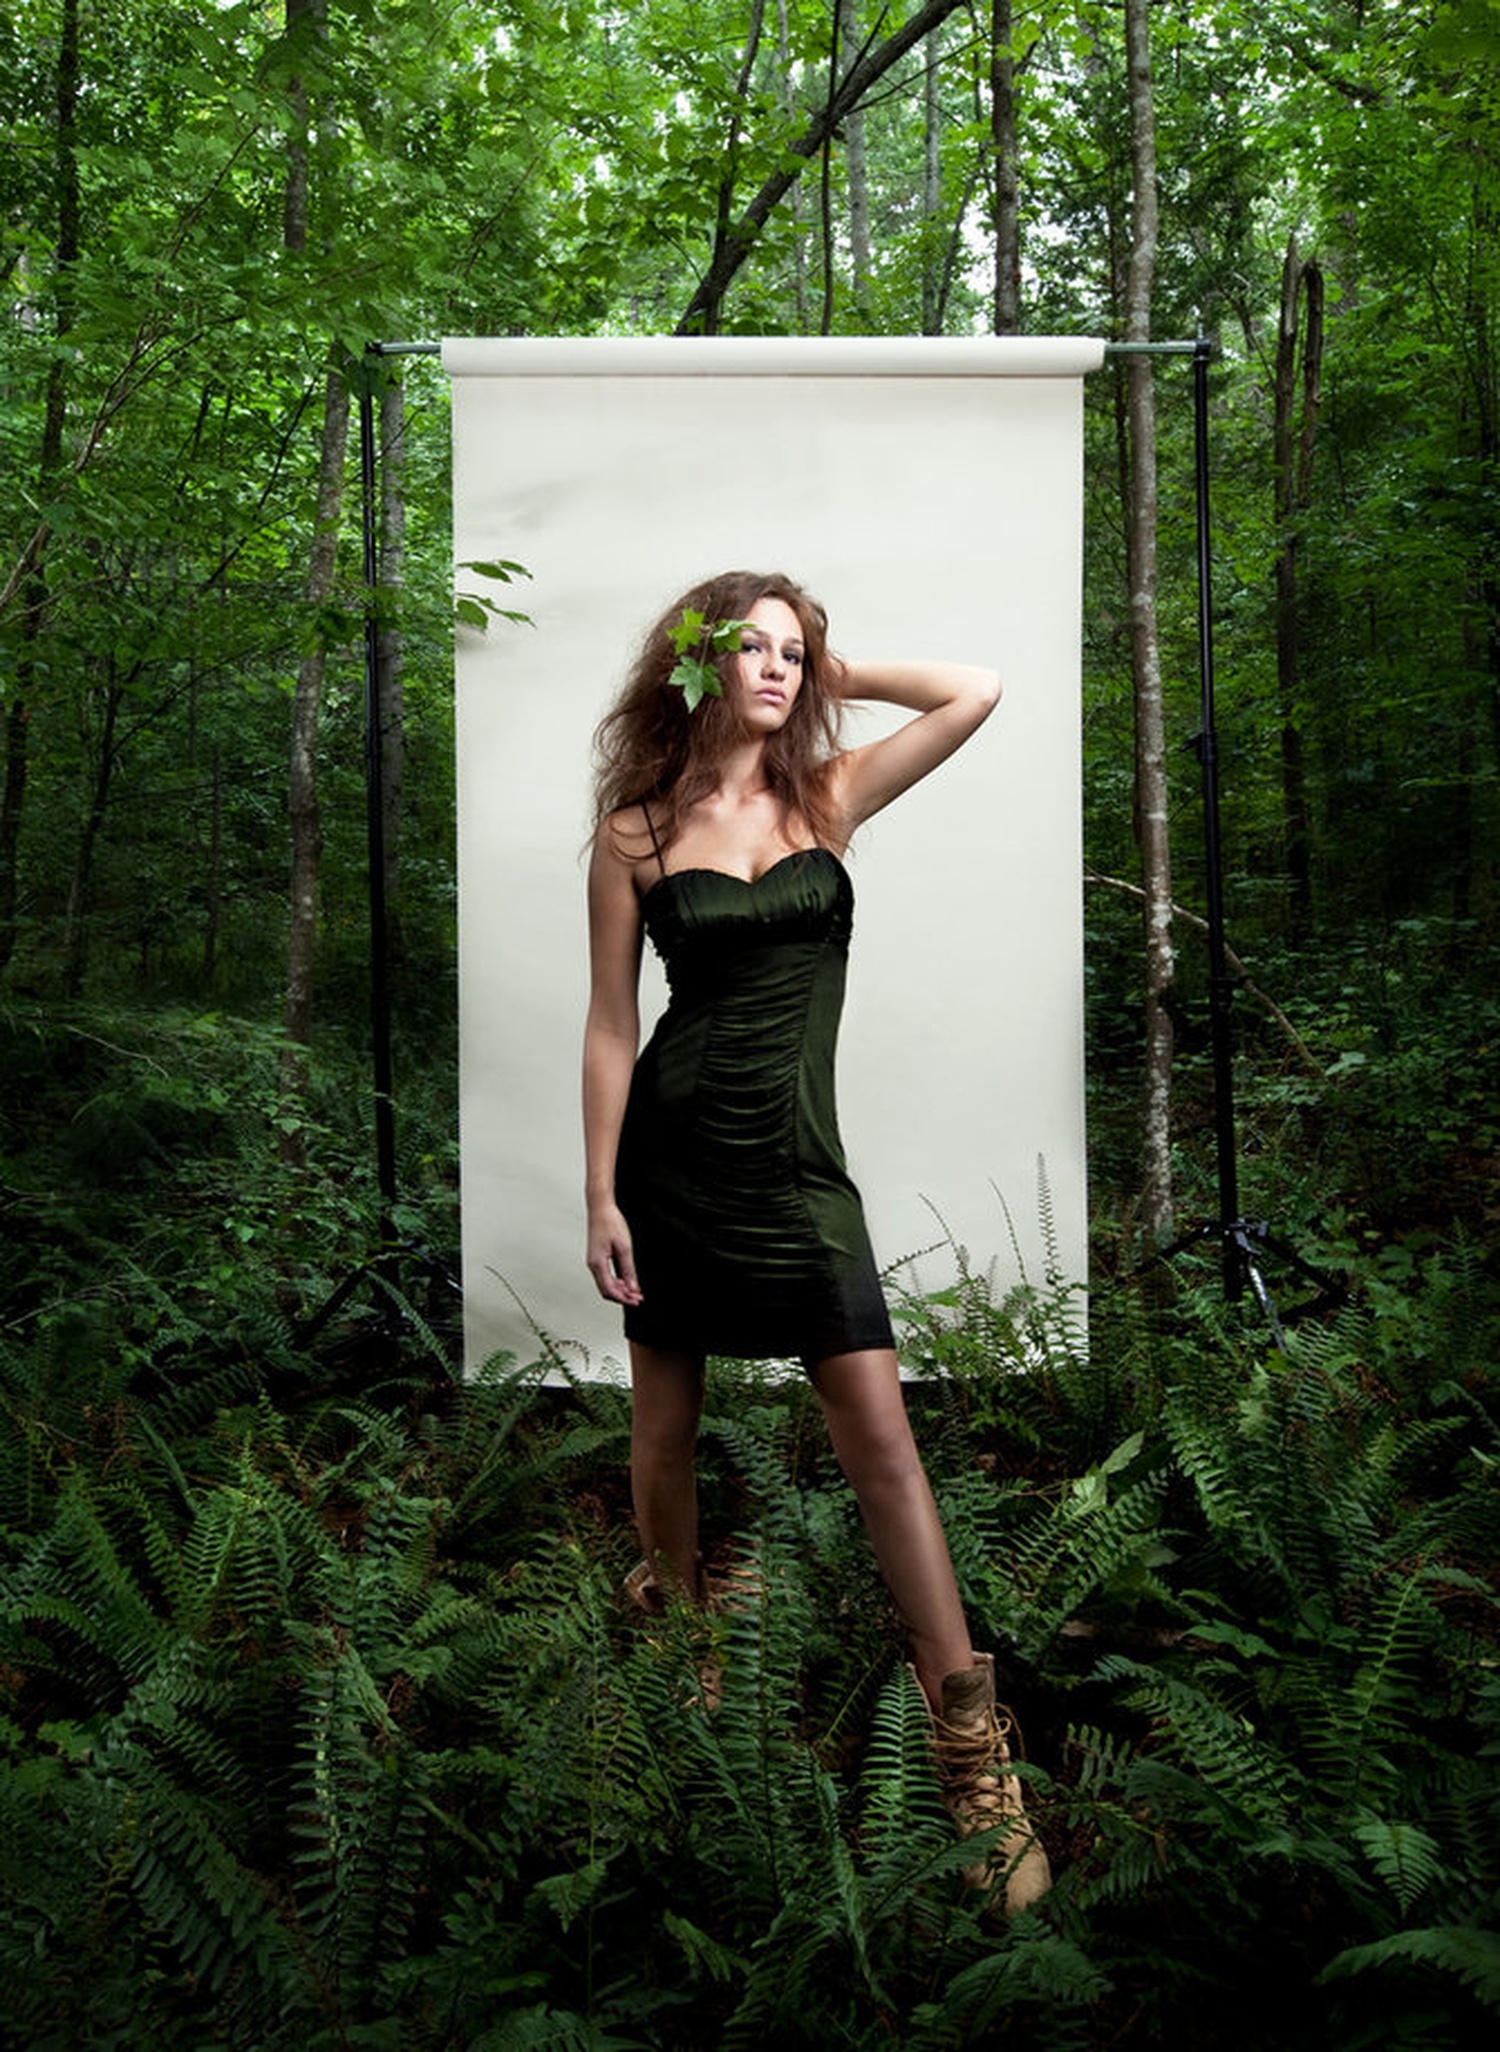 Tincbel naced sex video